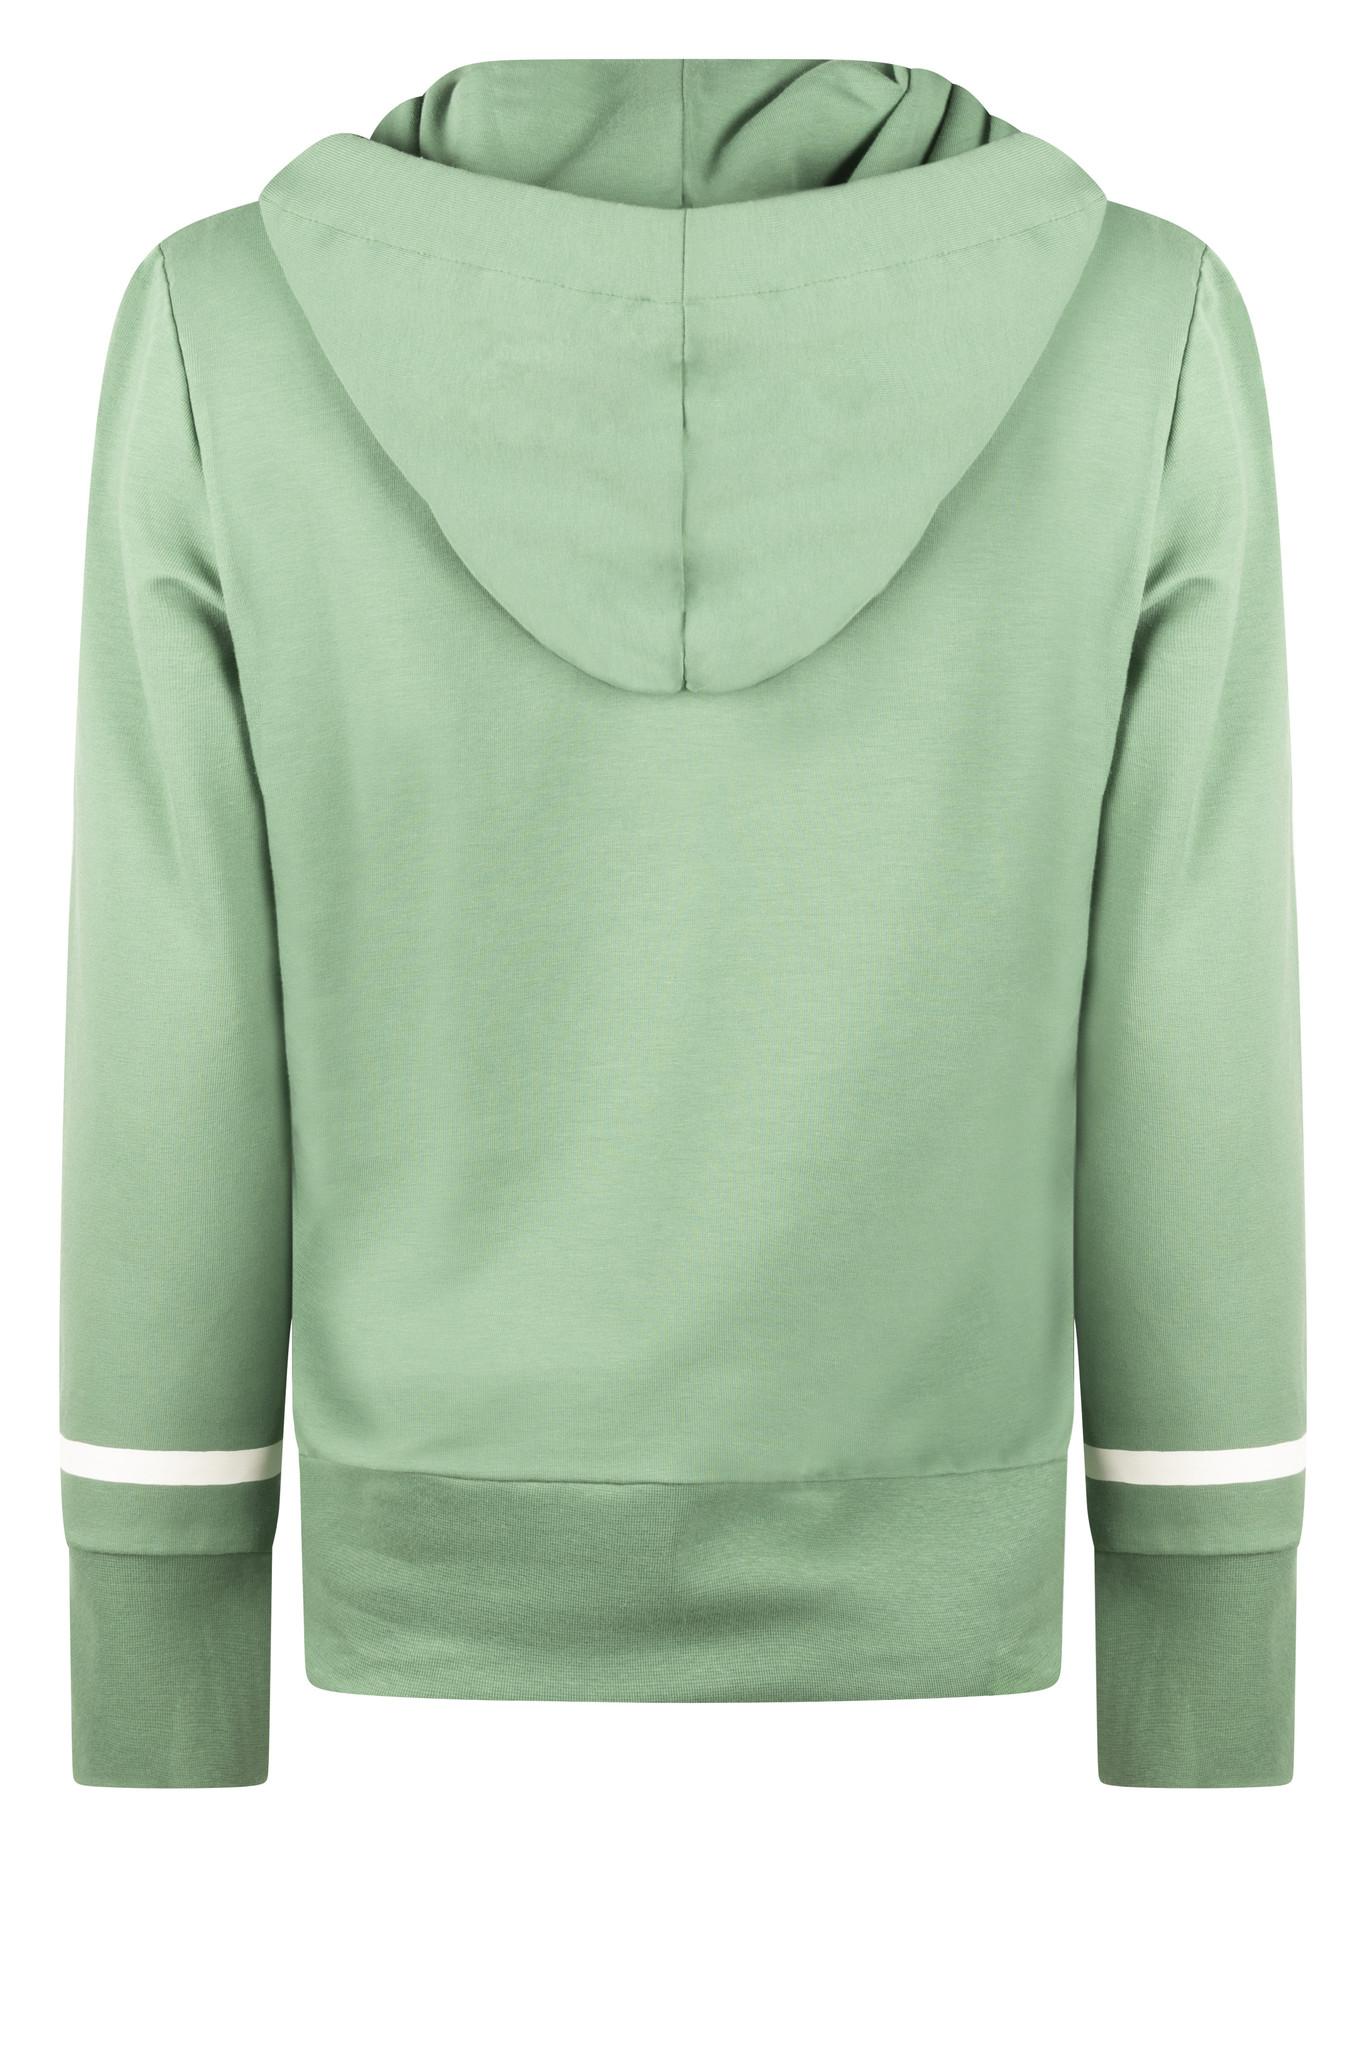 Zoso Zoso 215 Didi Hooded sweater techprint  green/offwhite